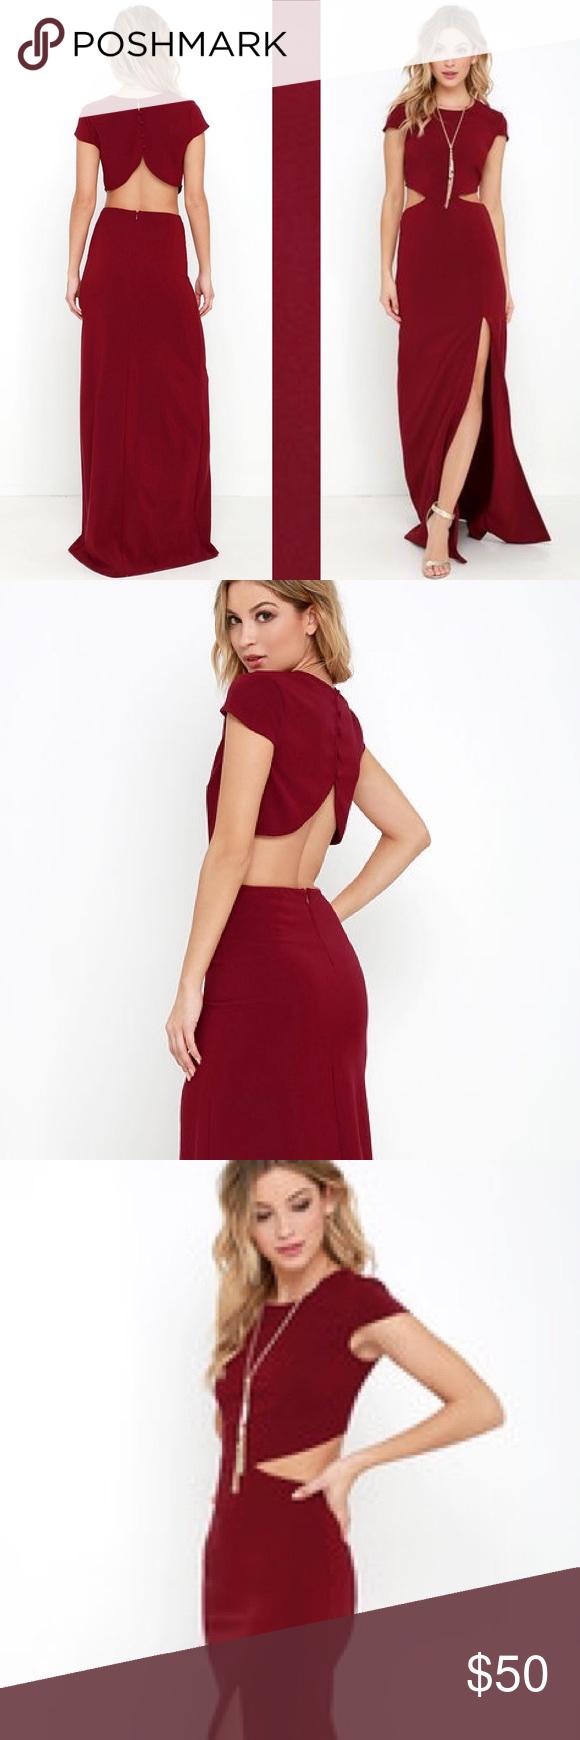 Wine Red \'Conversation Piece\' Lulu\'s Dress